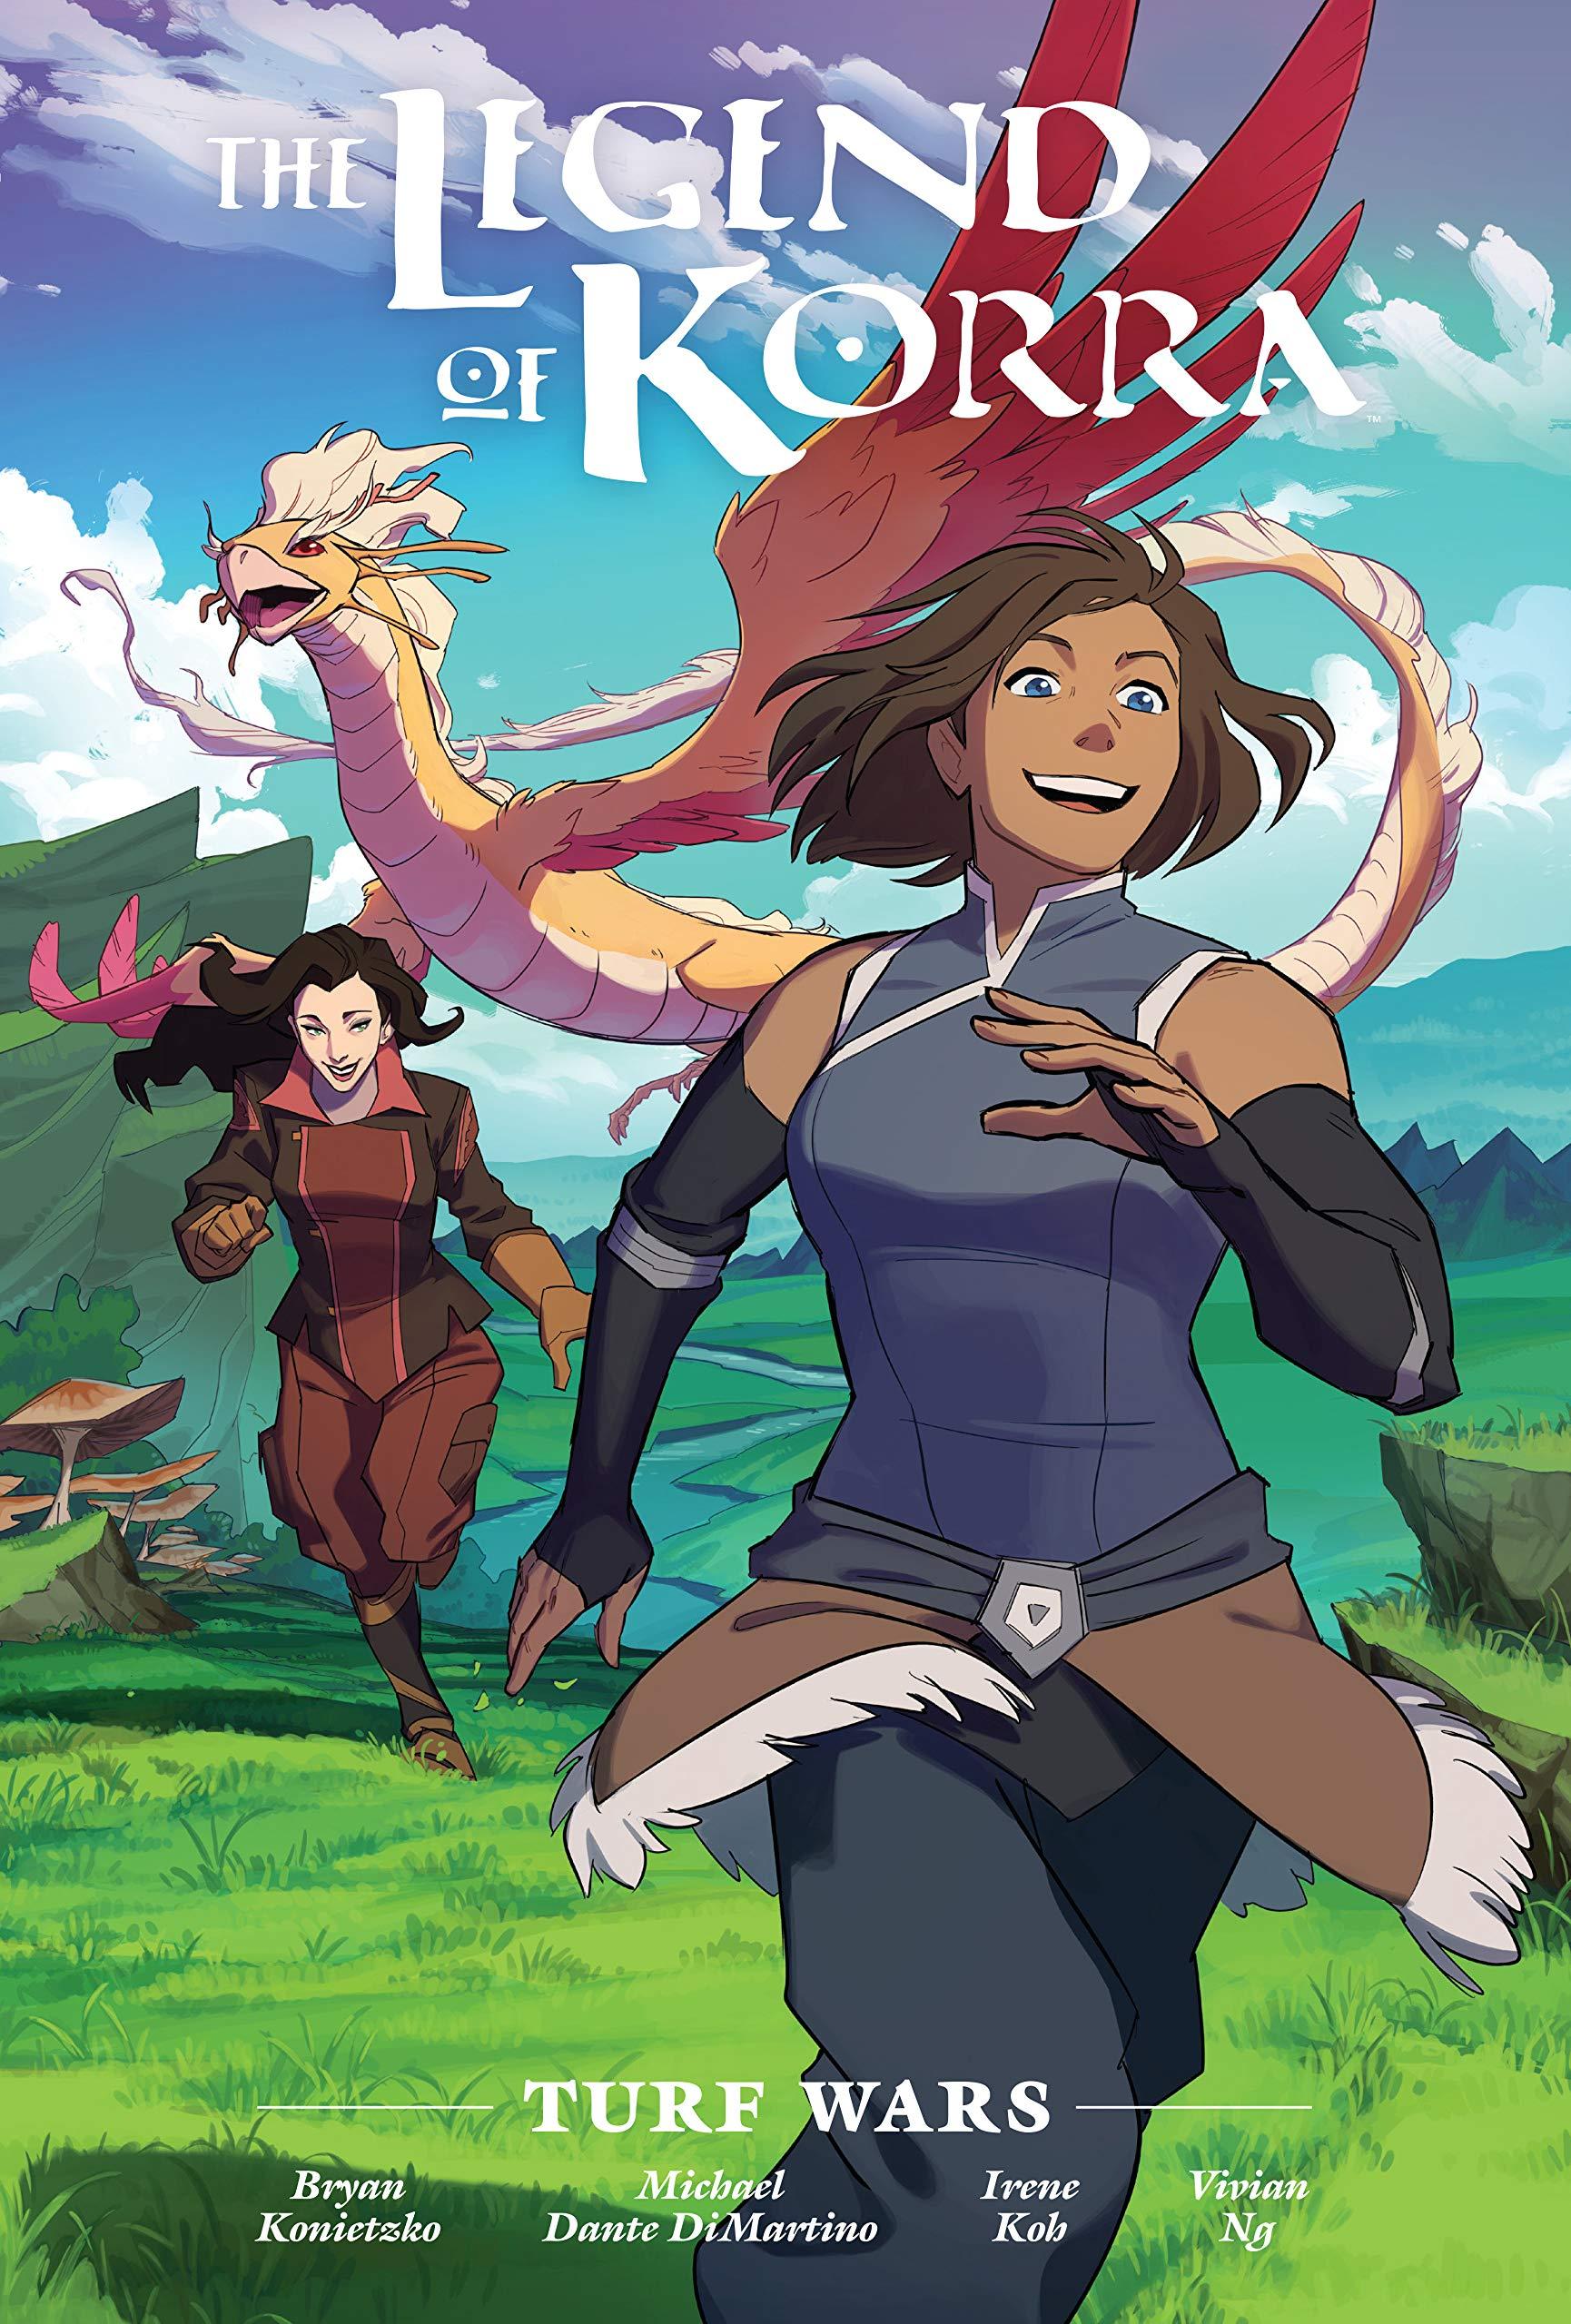 Amazon.fr - The Legend of Korra: Turf Wars Library Edition - DiMartino, Michael Dante, Konietzko, Bryan, Fish, Veronica, Koh, Irene - Livres